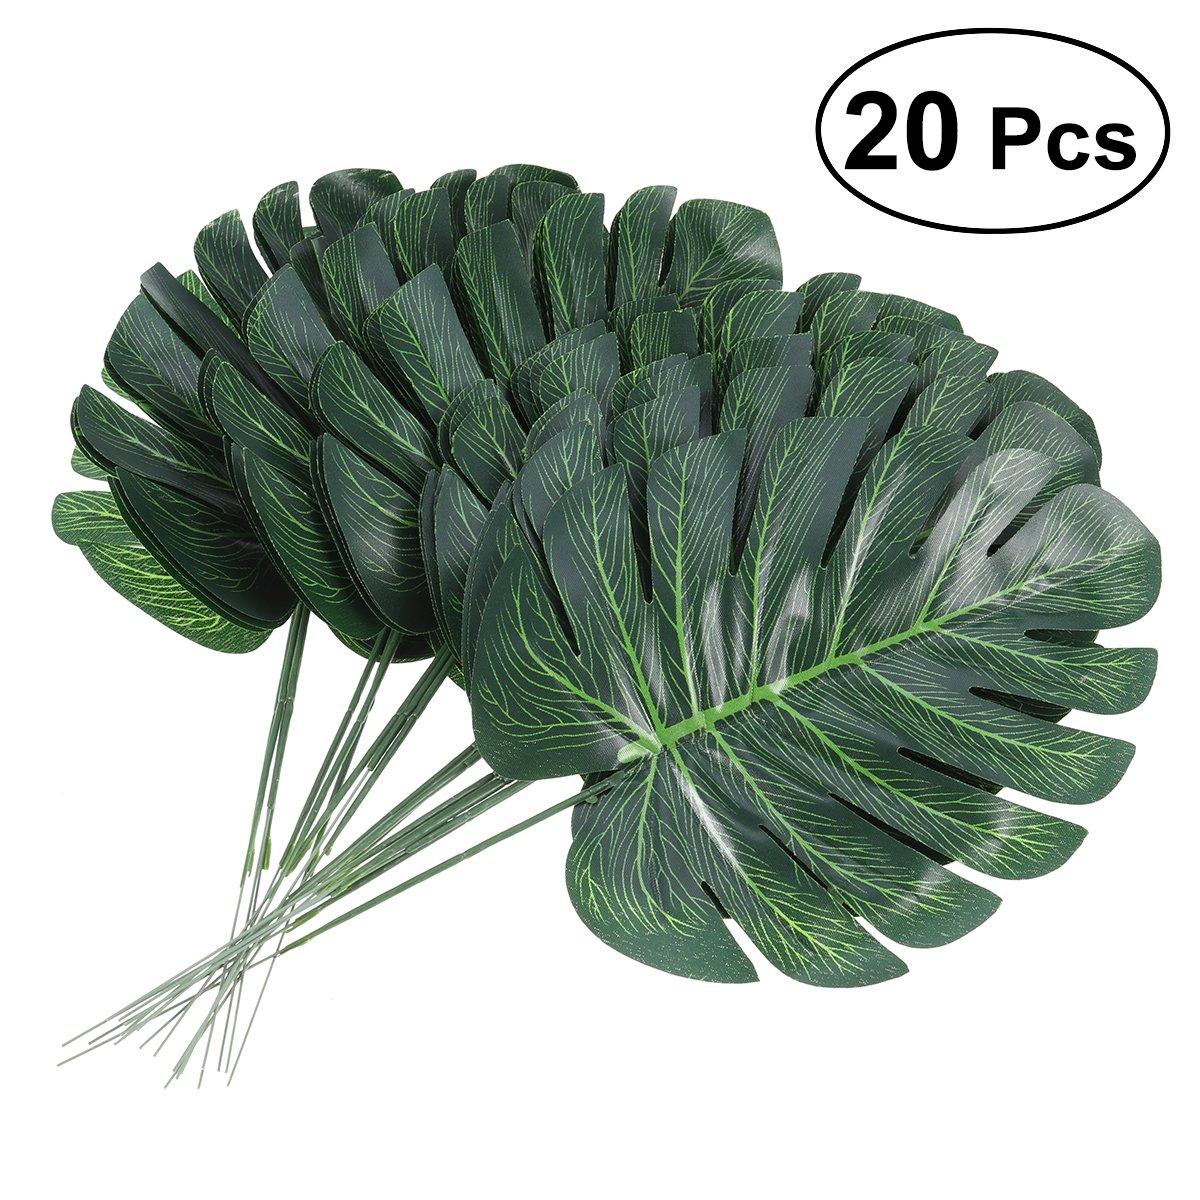 Tinkskyトロピカルヤシの葉人工リーフシミュレーション花人工植物フェイクMonstera葉ホーム装飾、20-pack B07BNF5HF5